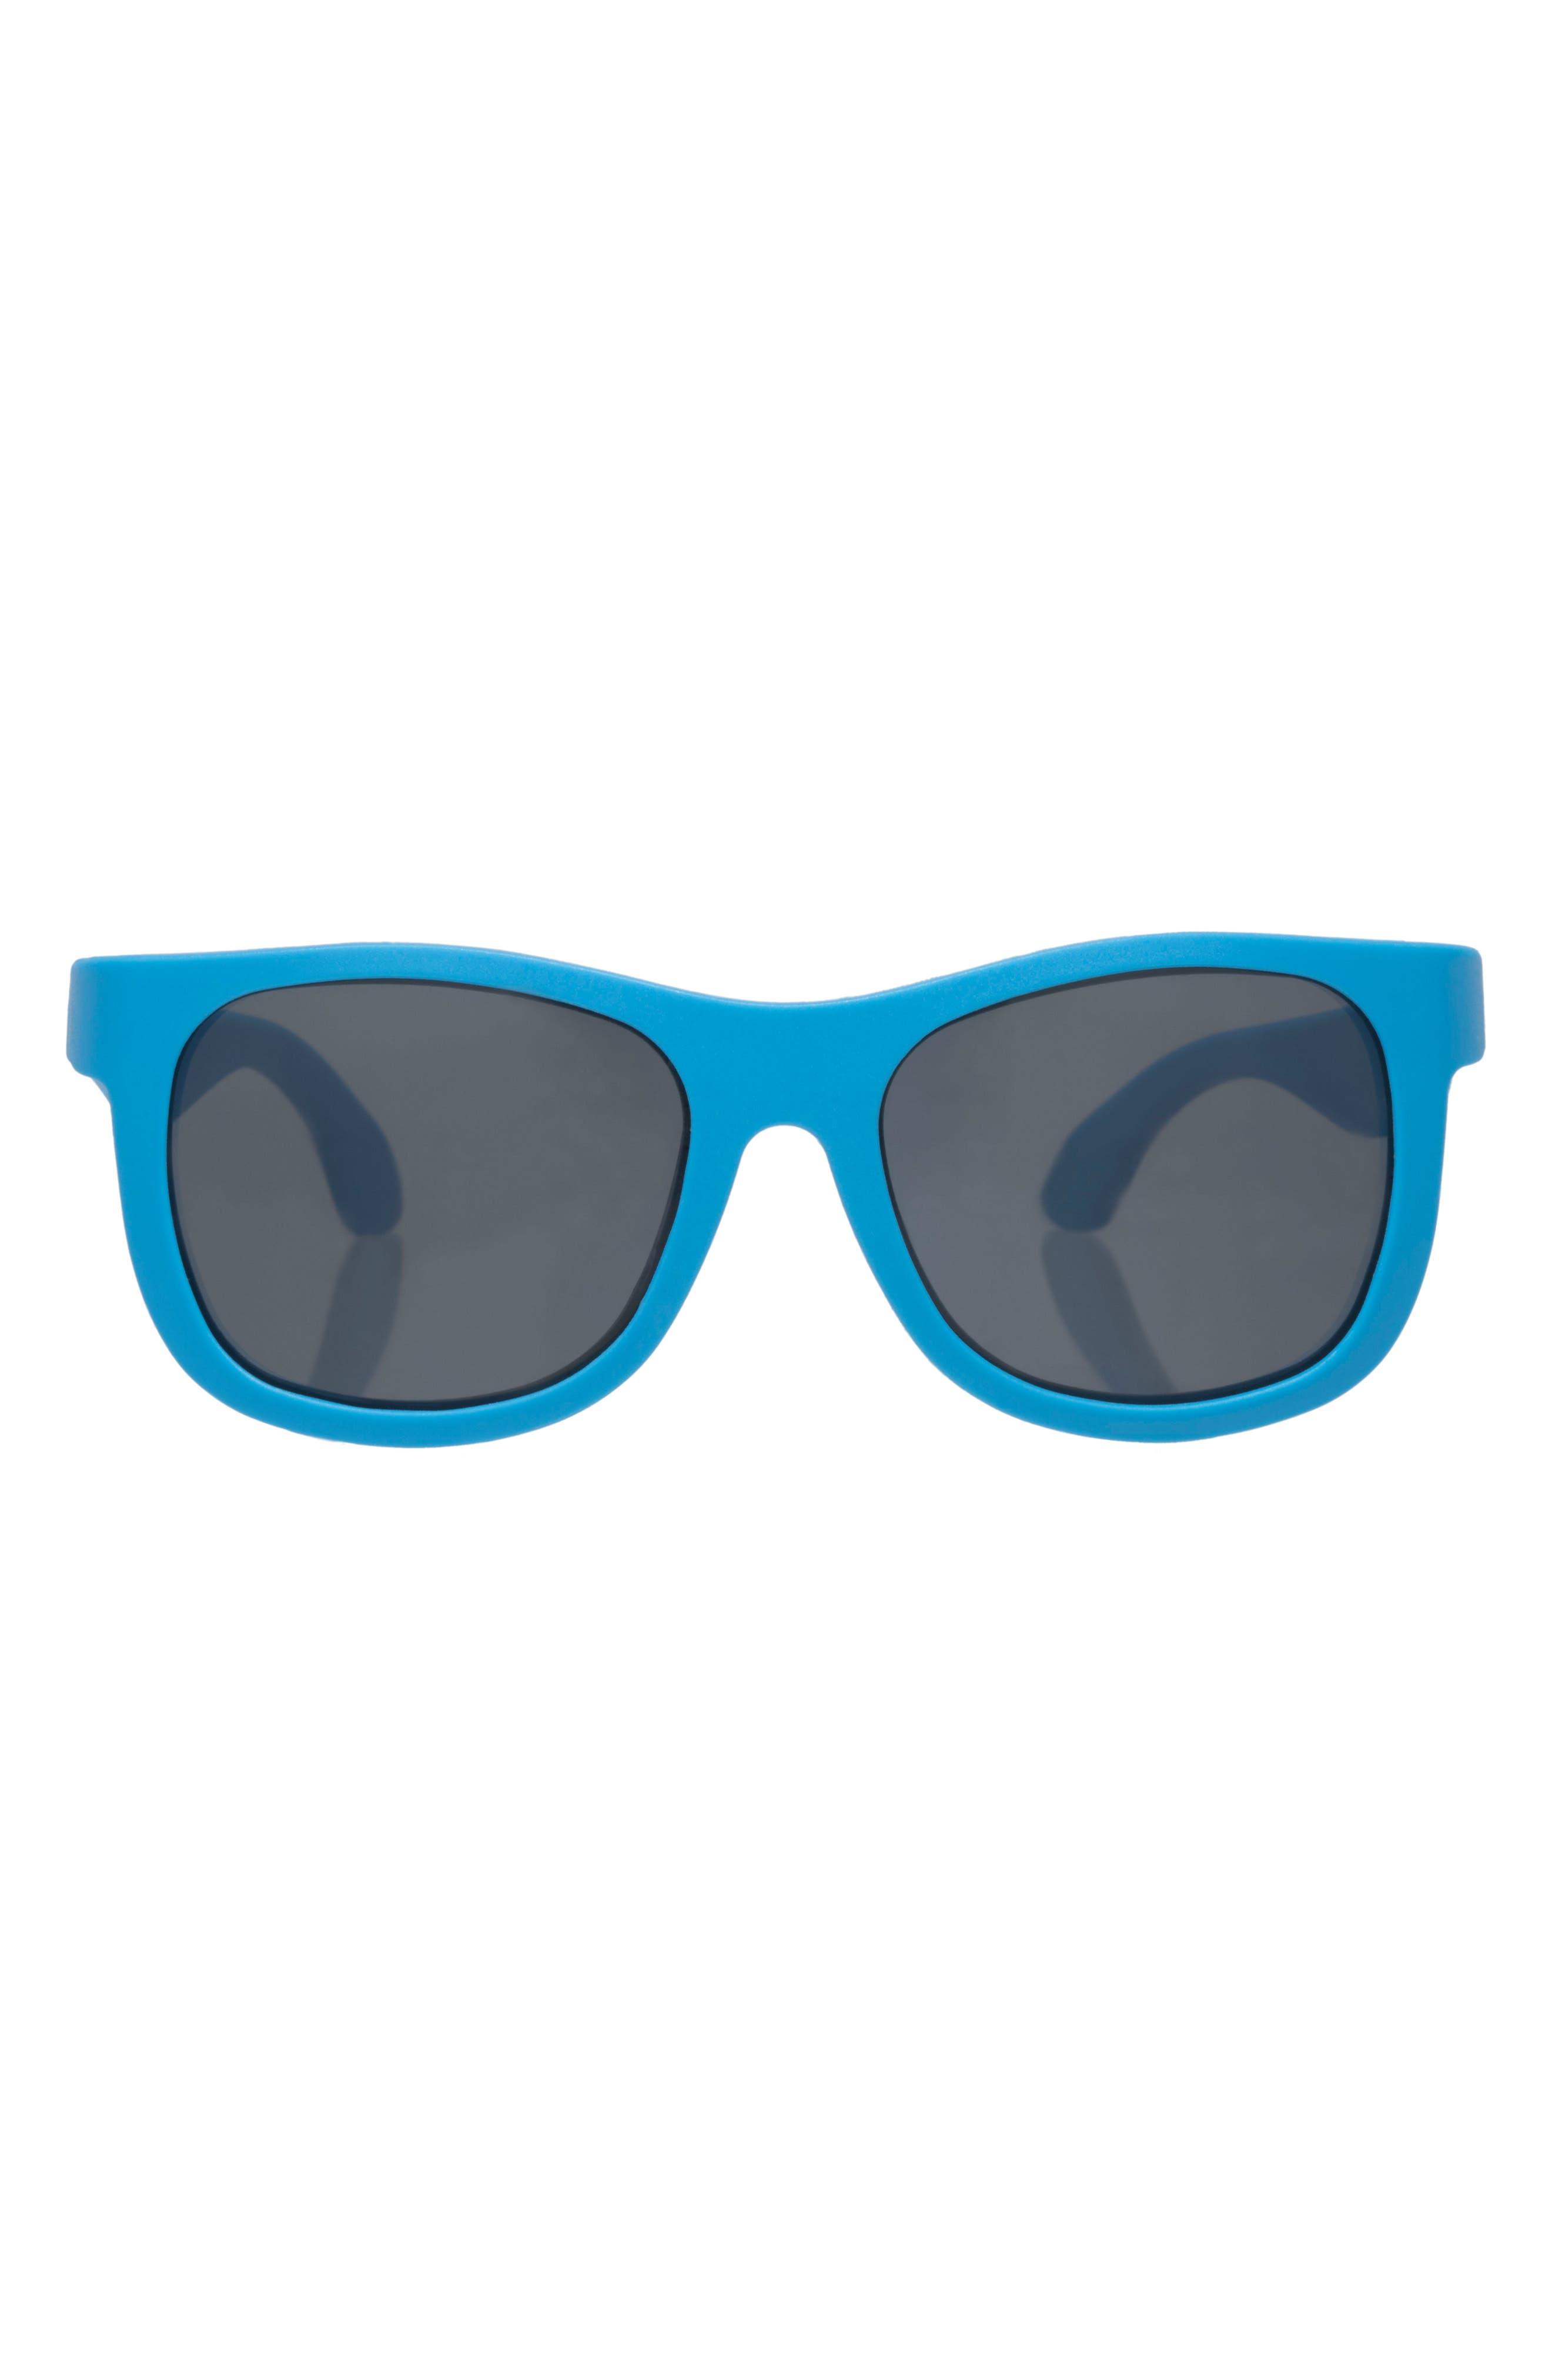 BABIATORS, Original Navigators Sunglasses, Main thumbnail 1, color, BLUE CRUSH